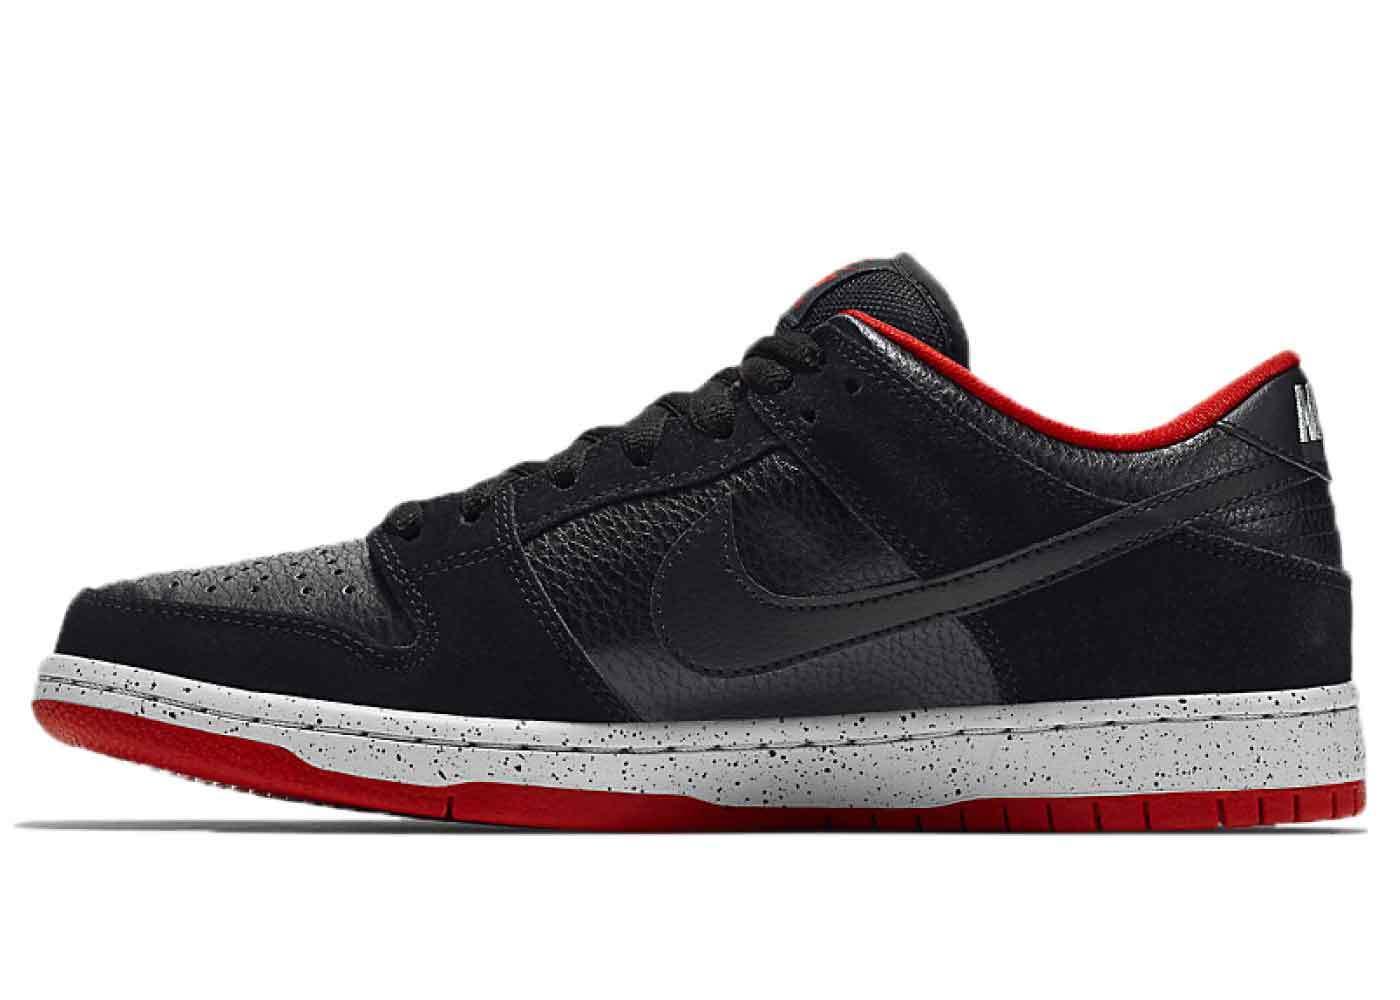 Nike SB Dunk Low Black Cementの写真